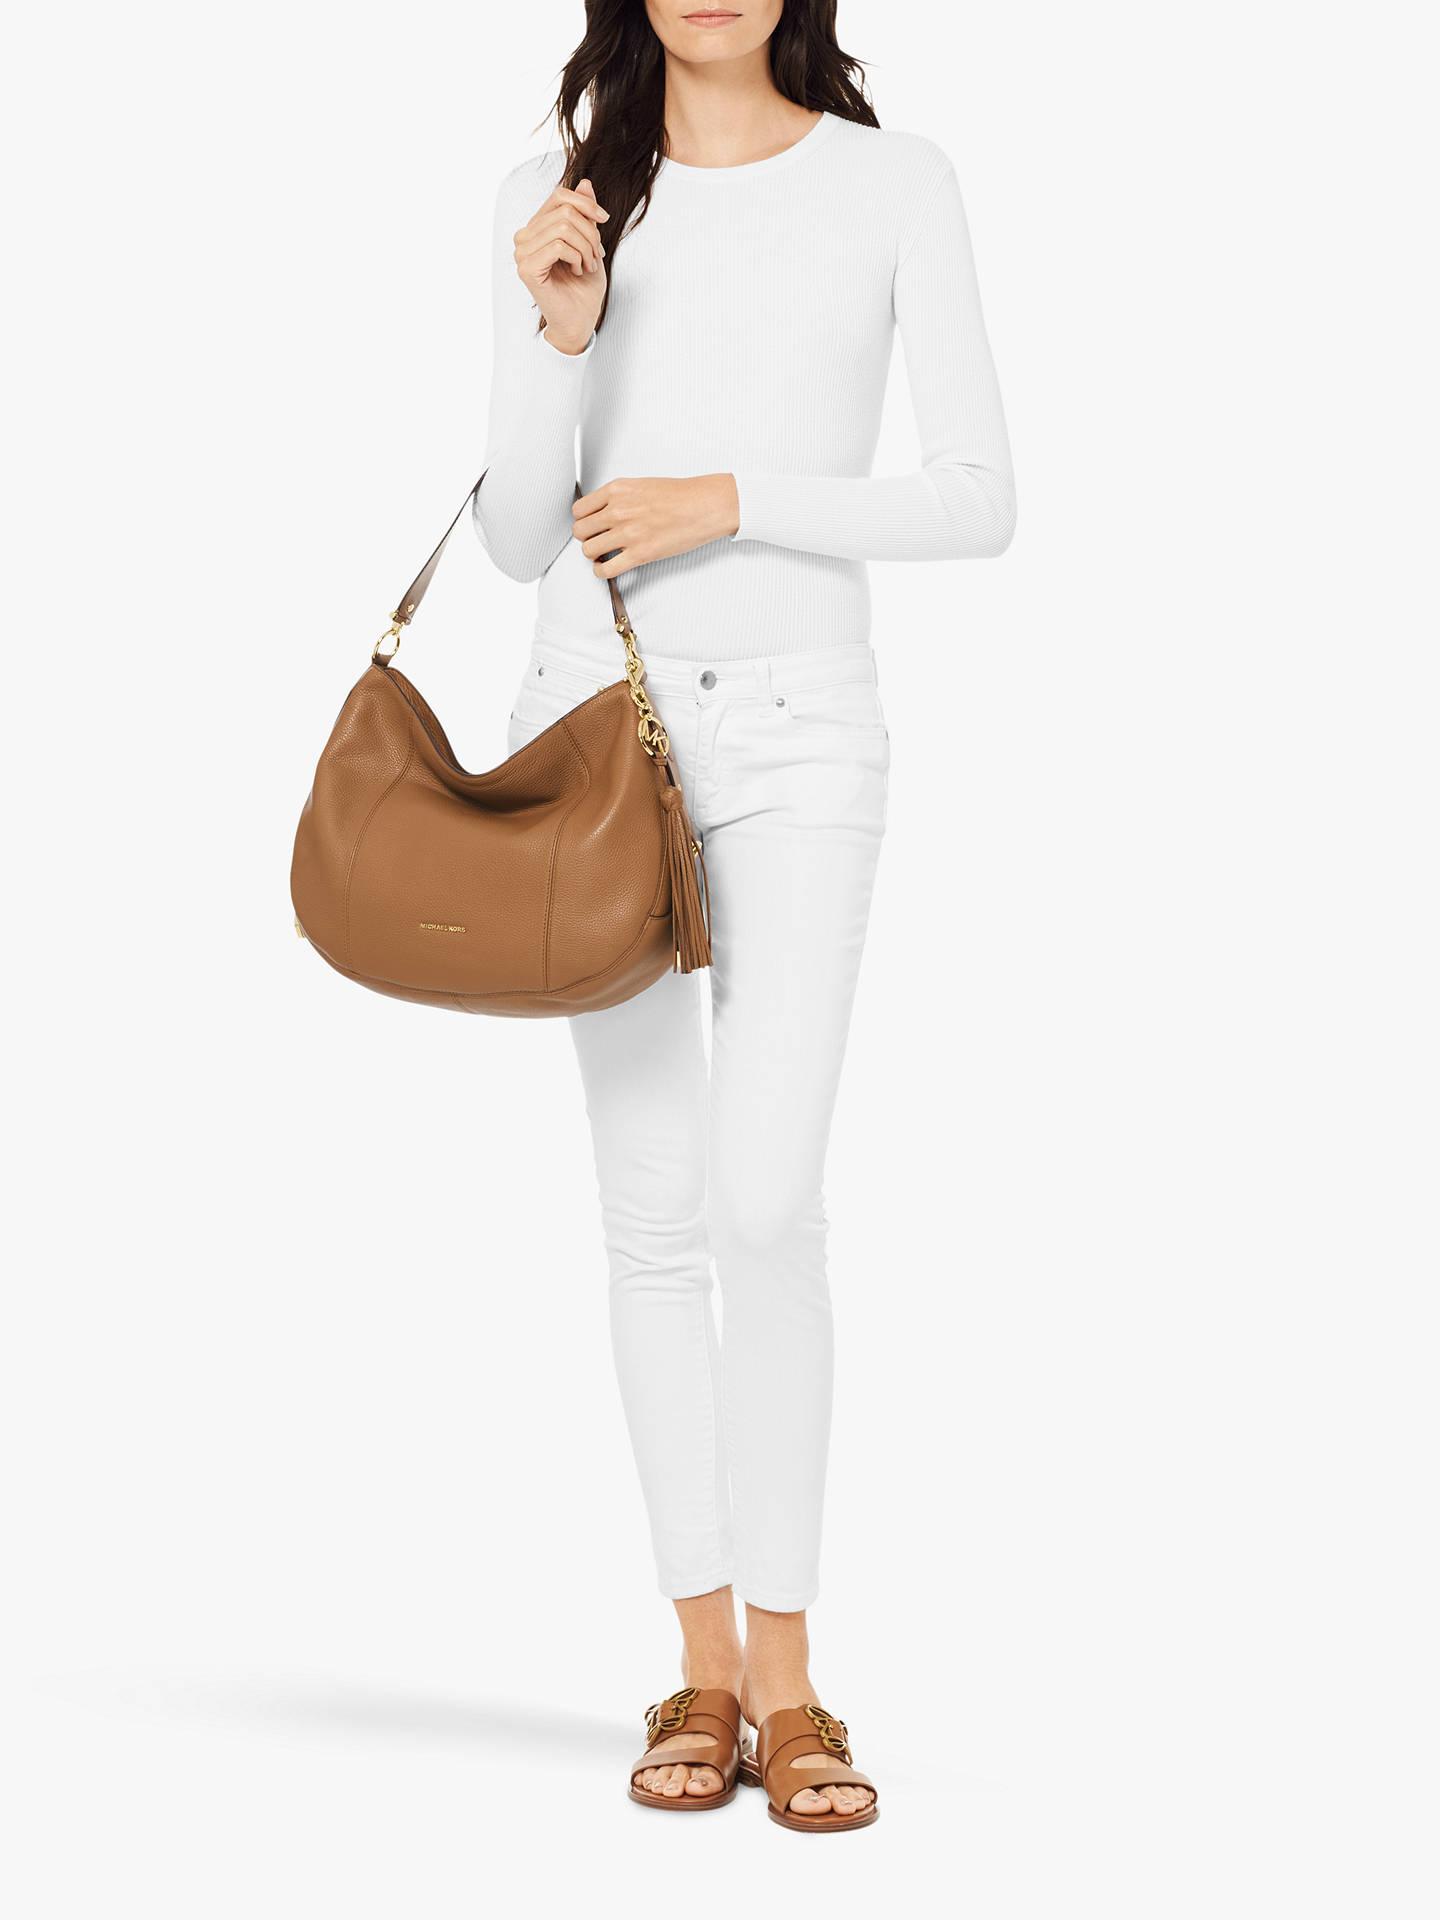 341f89d70f4c ... Buy MICHAEL Michael Kors Brooke Large Leather Hobo Bag, Acorn Online at  johnlewis.com